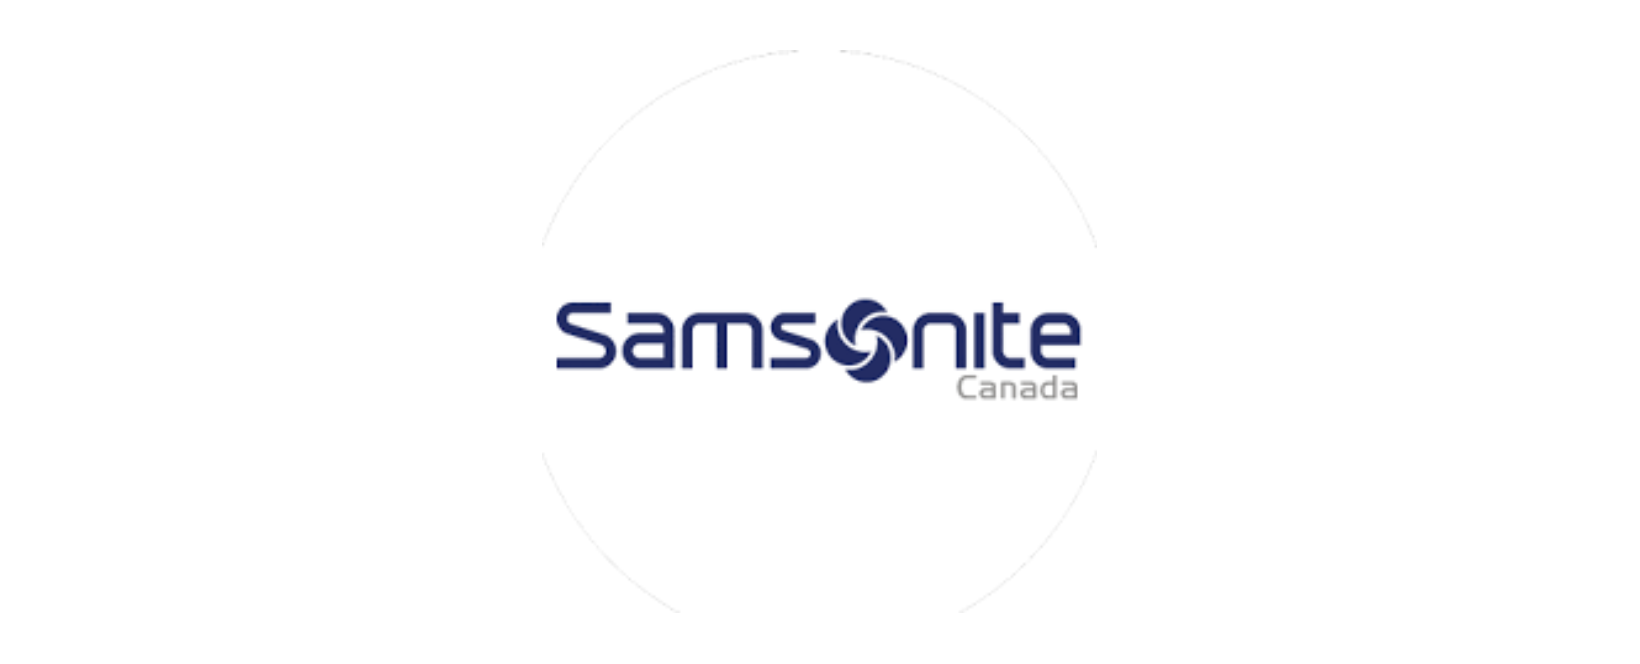 Samsonite Canada Discount Code 2021